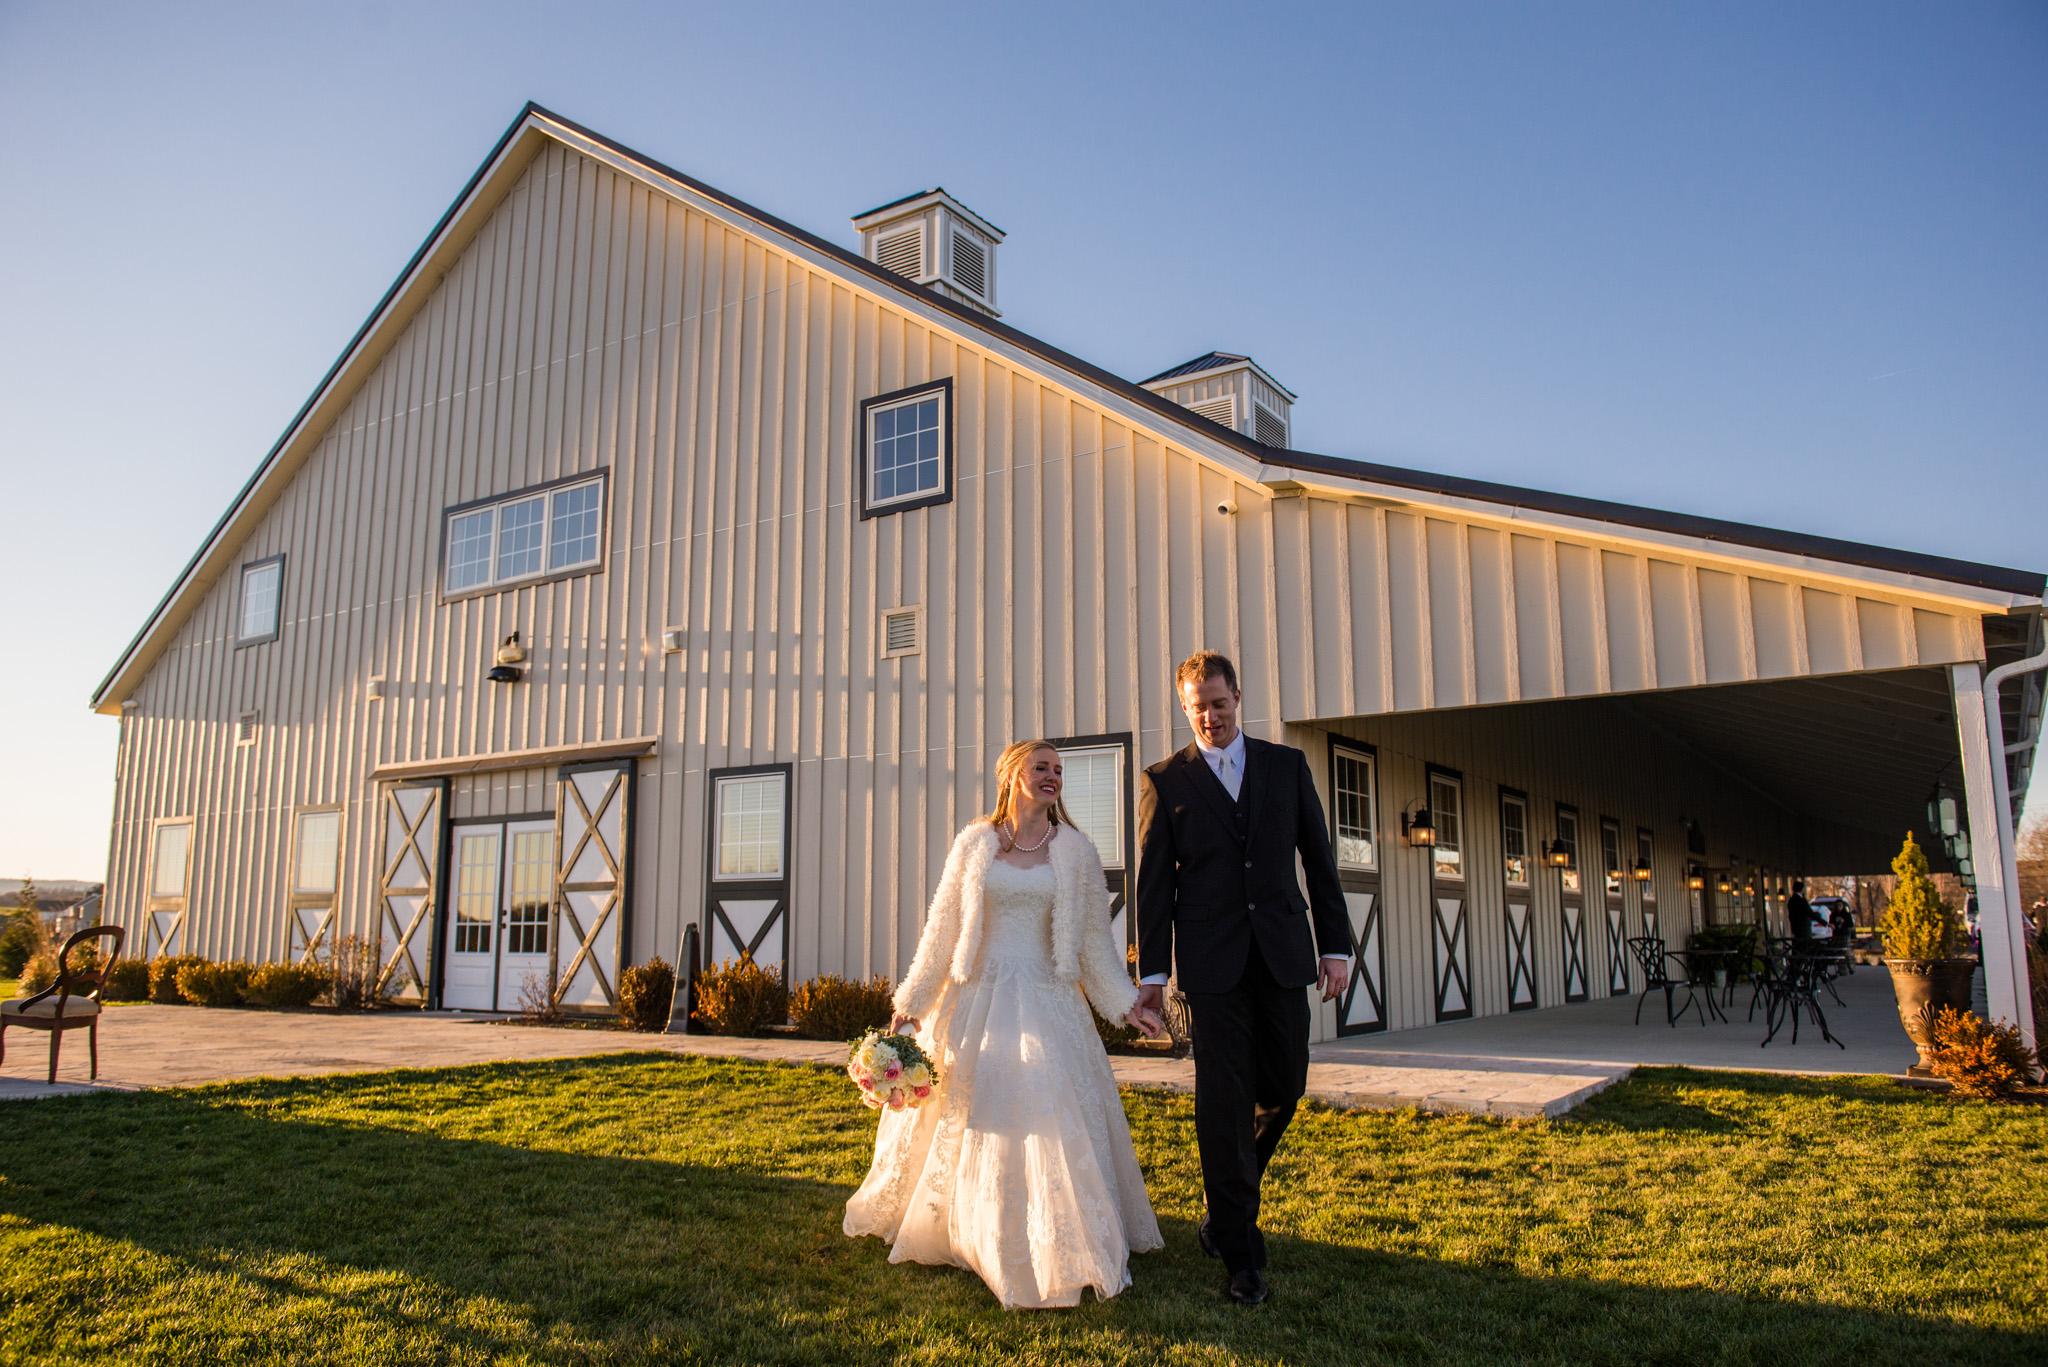 Shadow Creek Wedding.Wedding At Shadow Creek Lucas And Kathleen Rob Jinks Photography